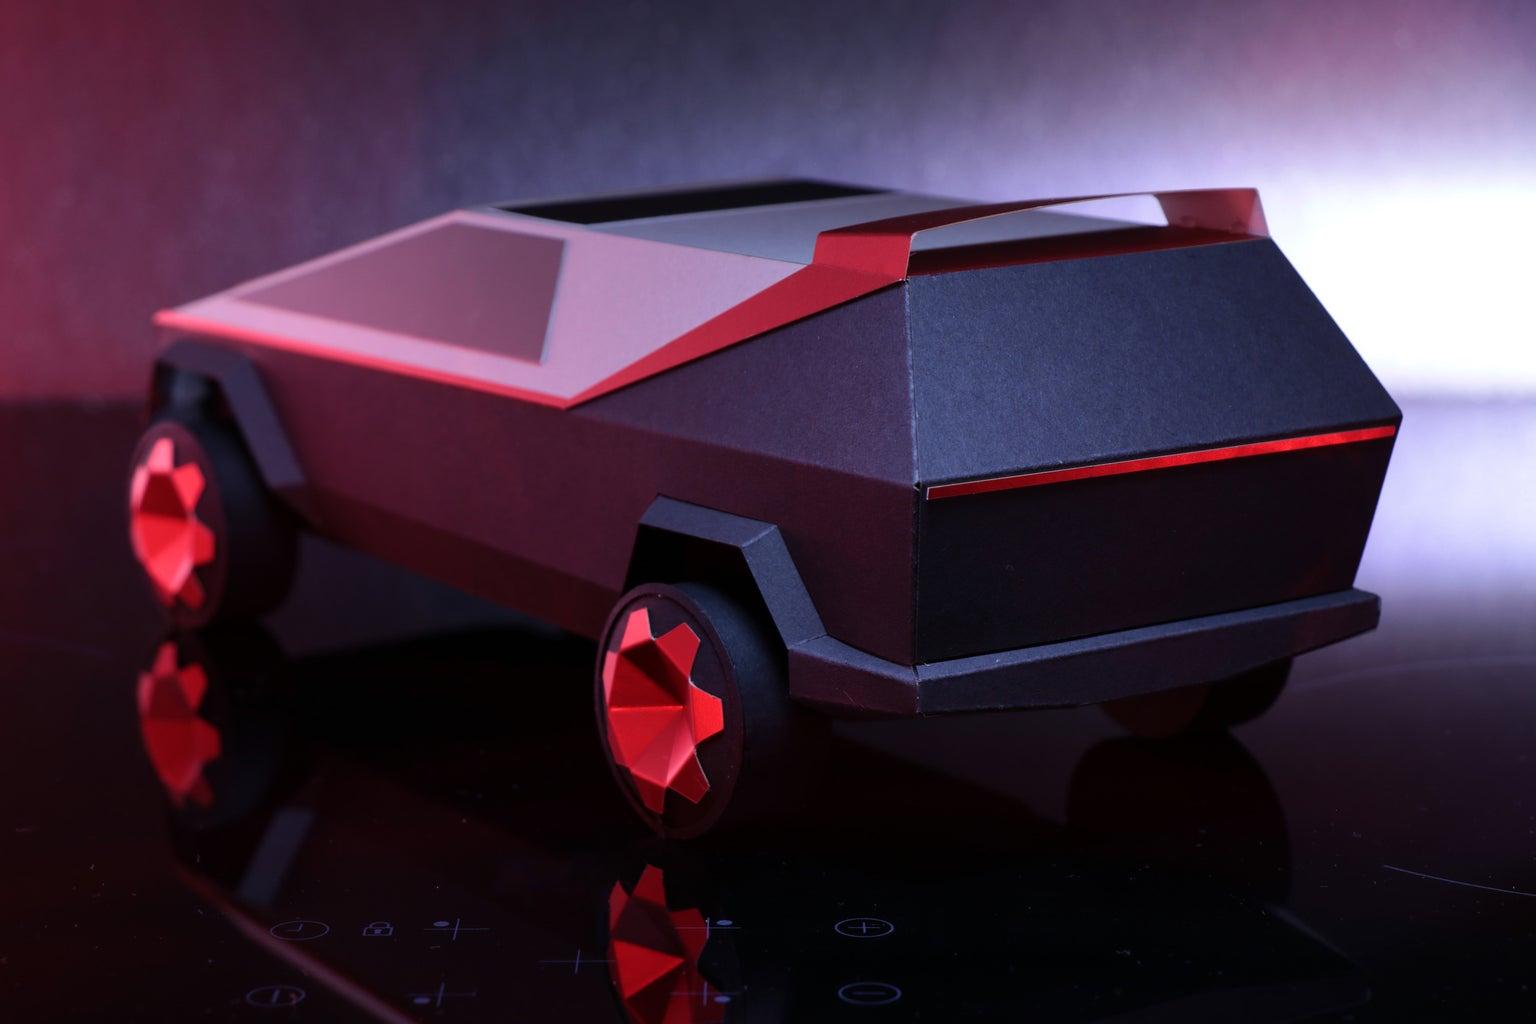 Customize! Made an A-Team Style Cybervan